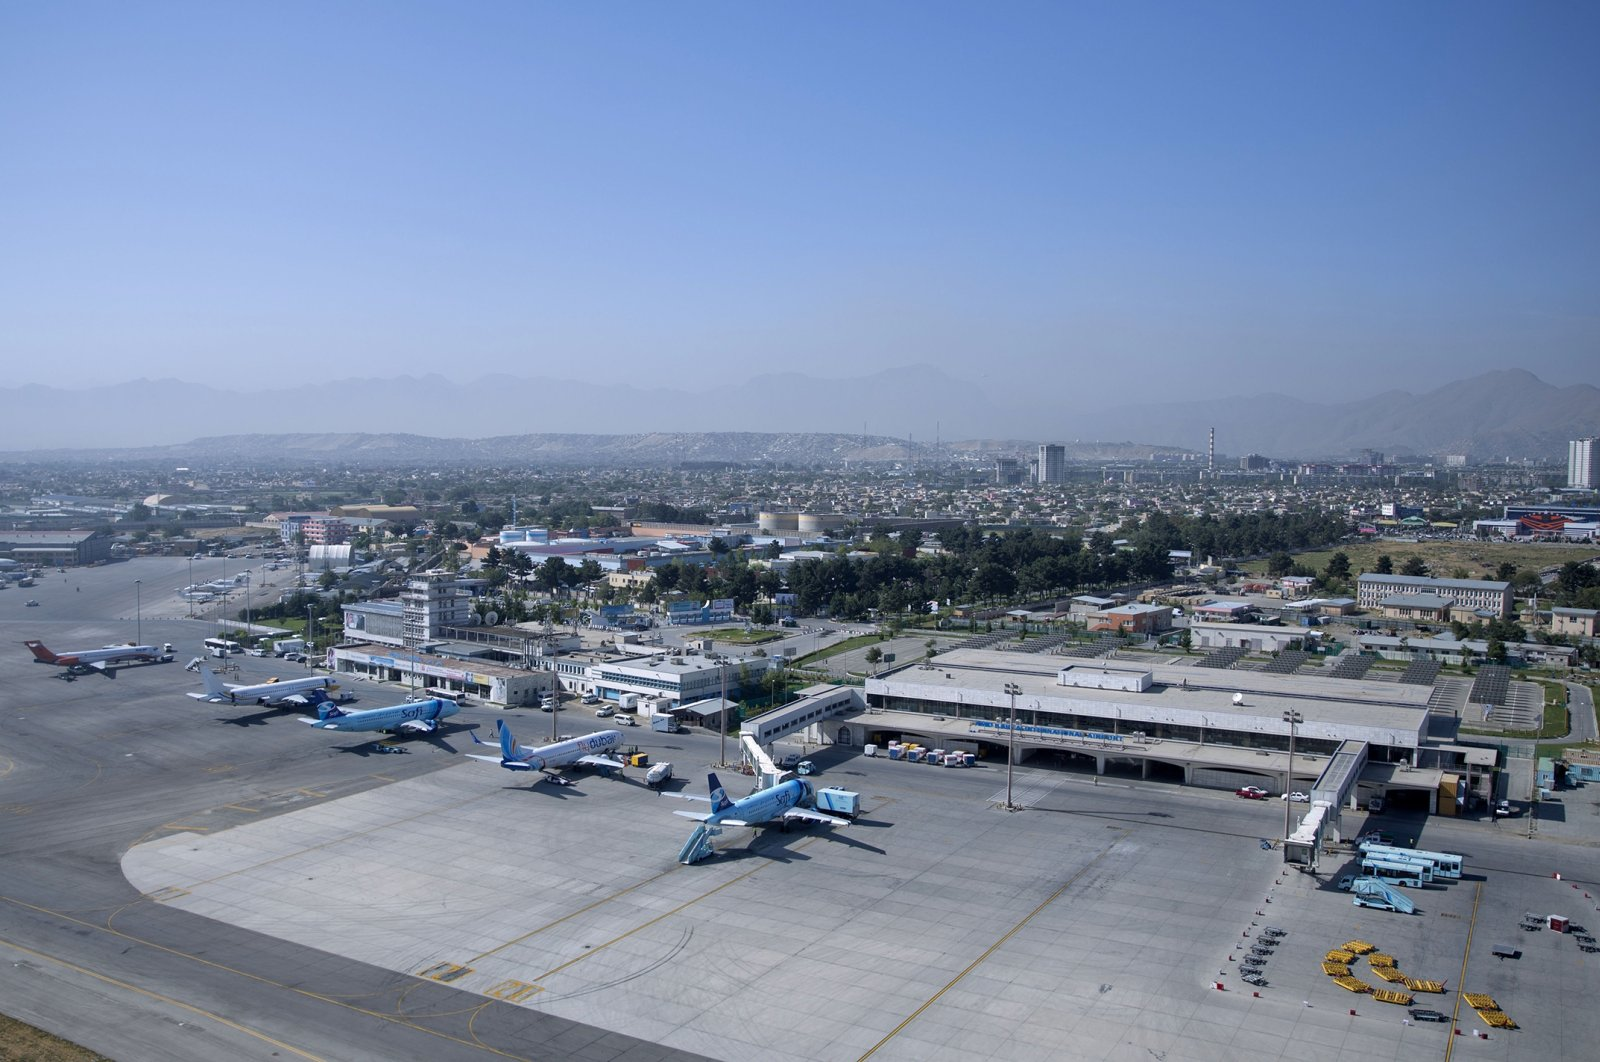 Hamid Karzai International Airport in Kabul, Afghanistan, July 25, 2015. (AP File Photo)